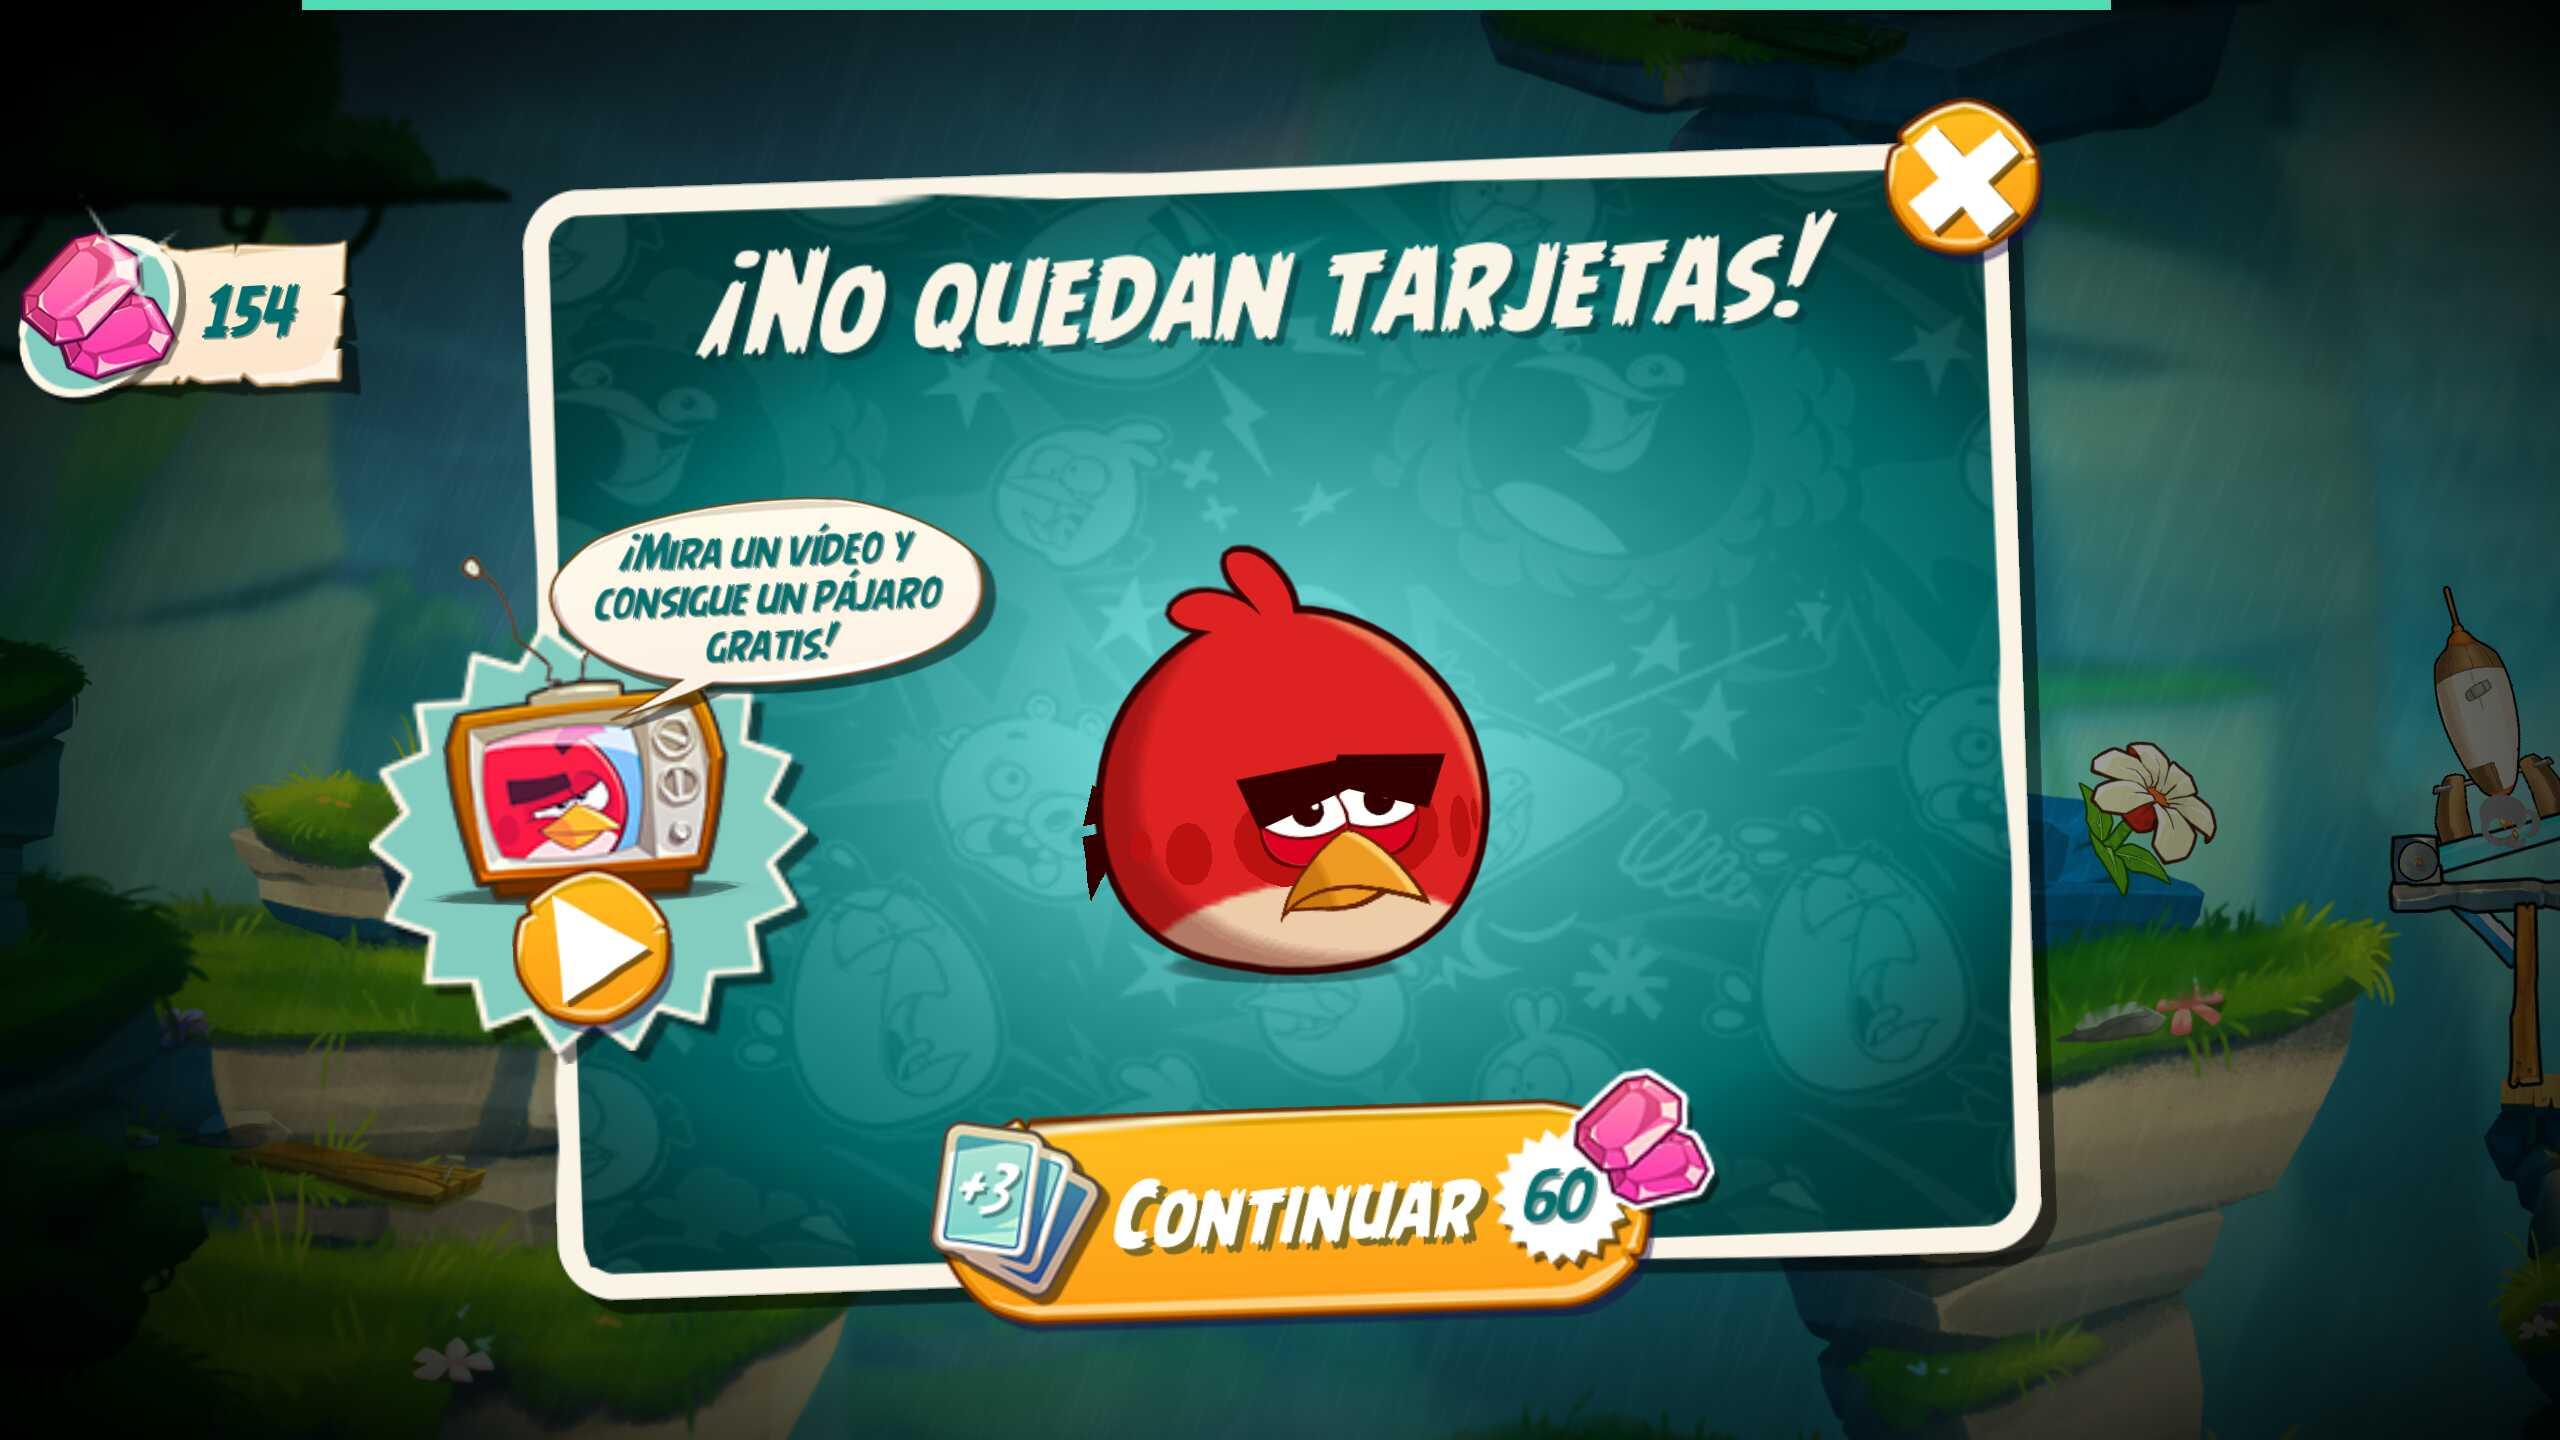 Conseguir tarjetas extra en Angry Birds 2